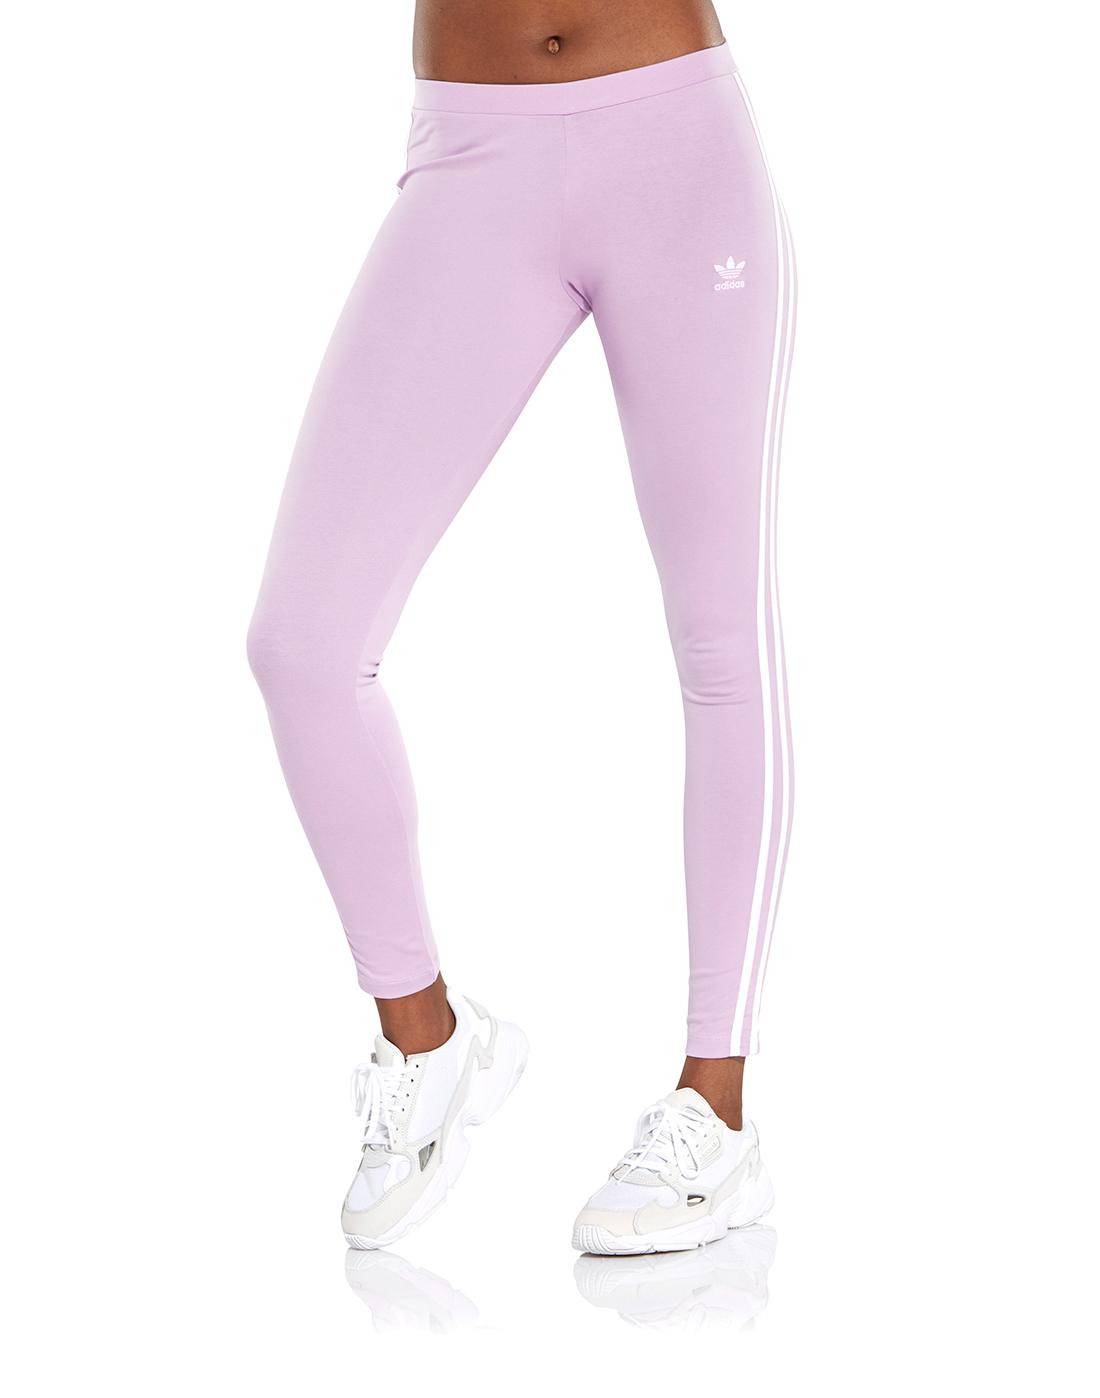 c31f4d114149e Women's Purple adidas Originals Leggings | Life Style Sports